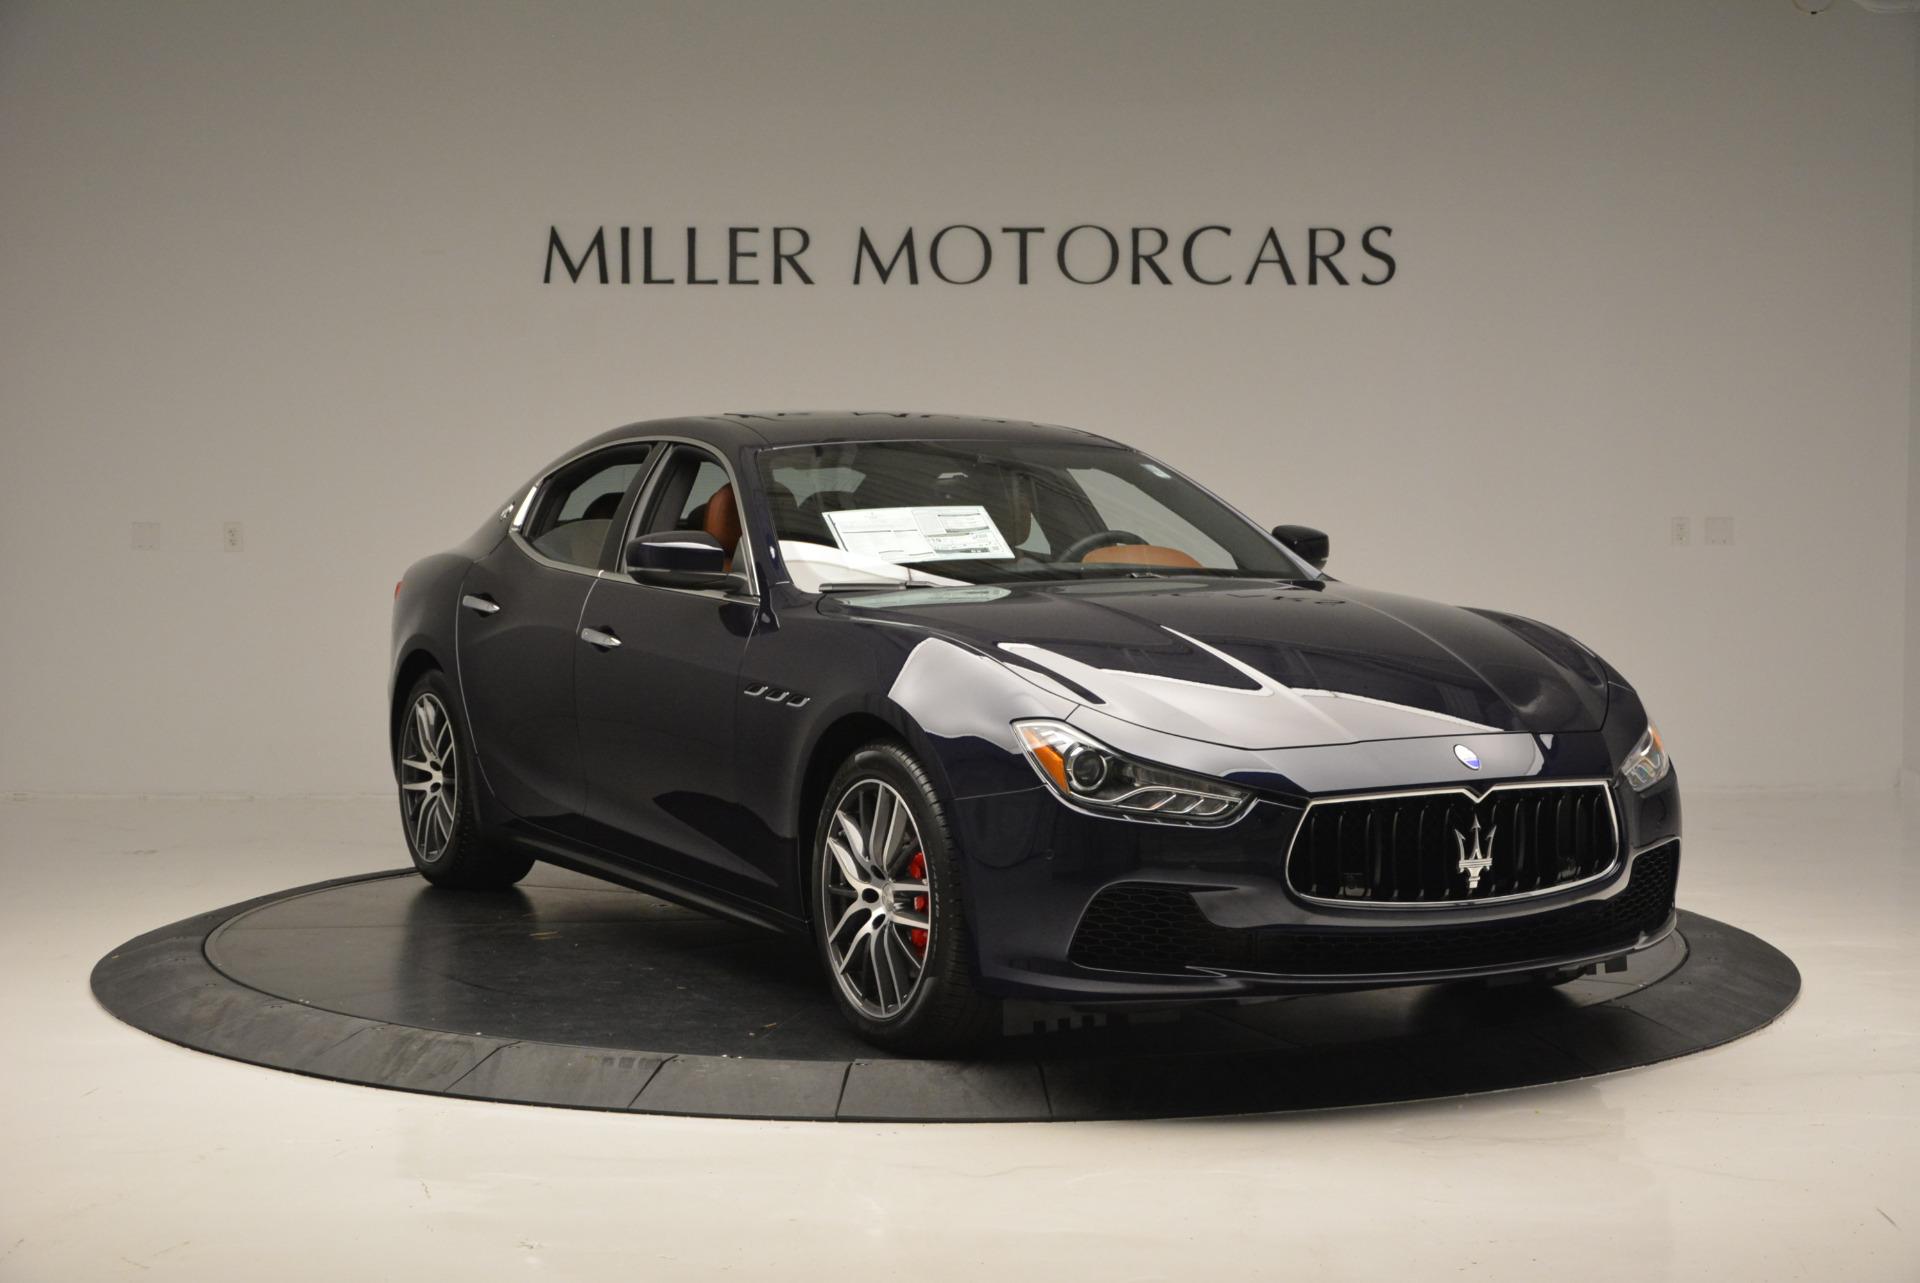 Used 2017 Maserati Ghibli S Q4 - EX Loaner For Sale In Greenwich, CT 567_p11